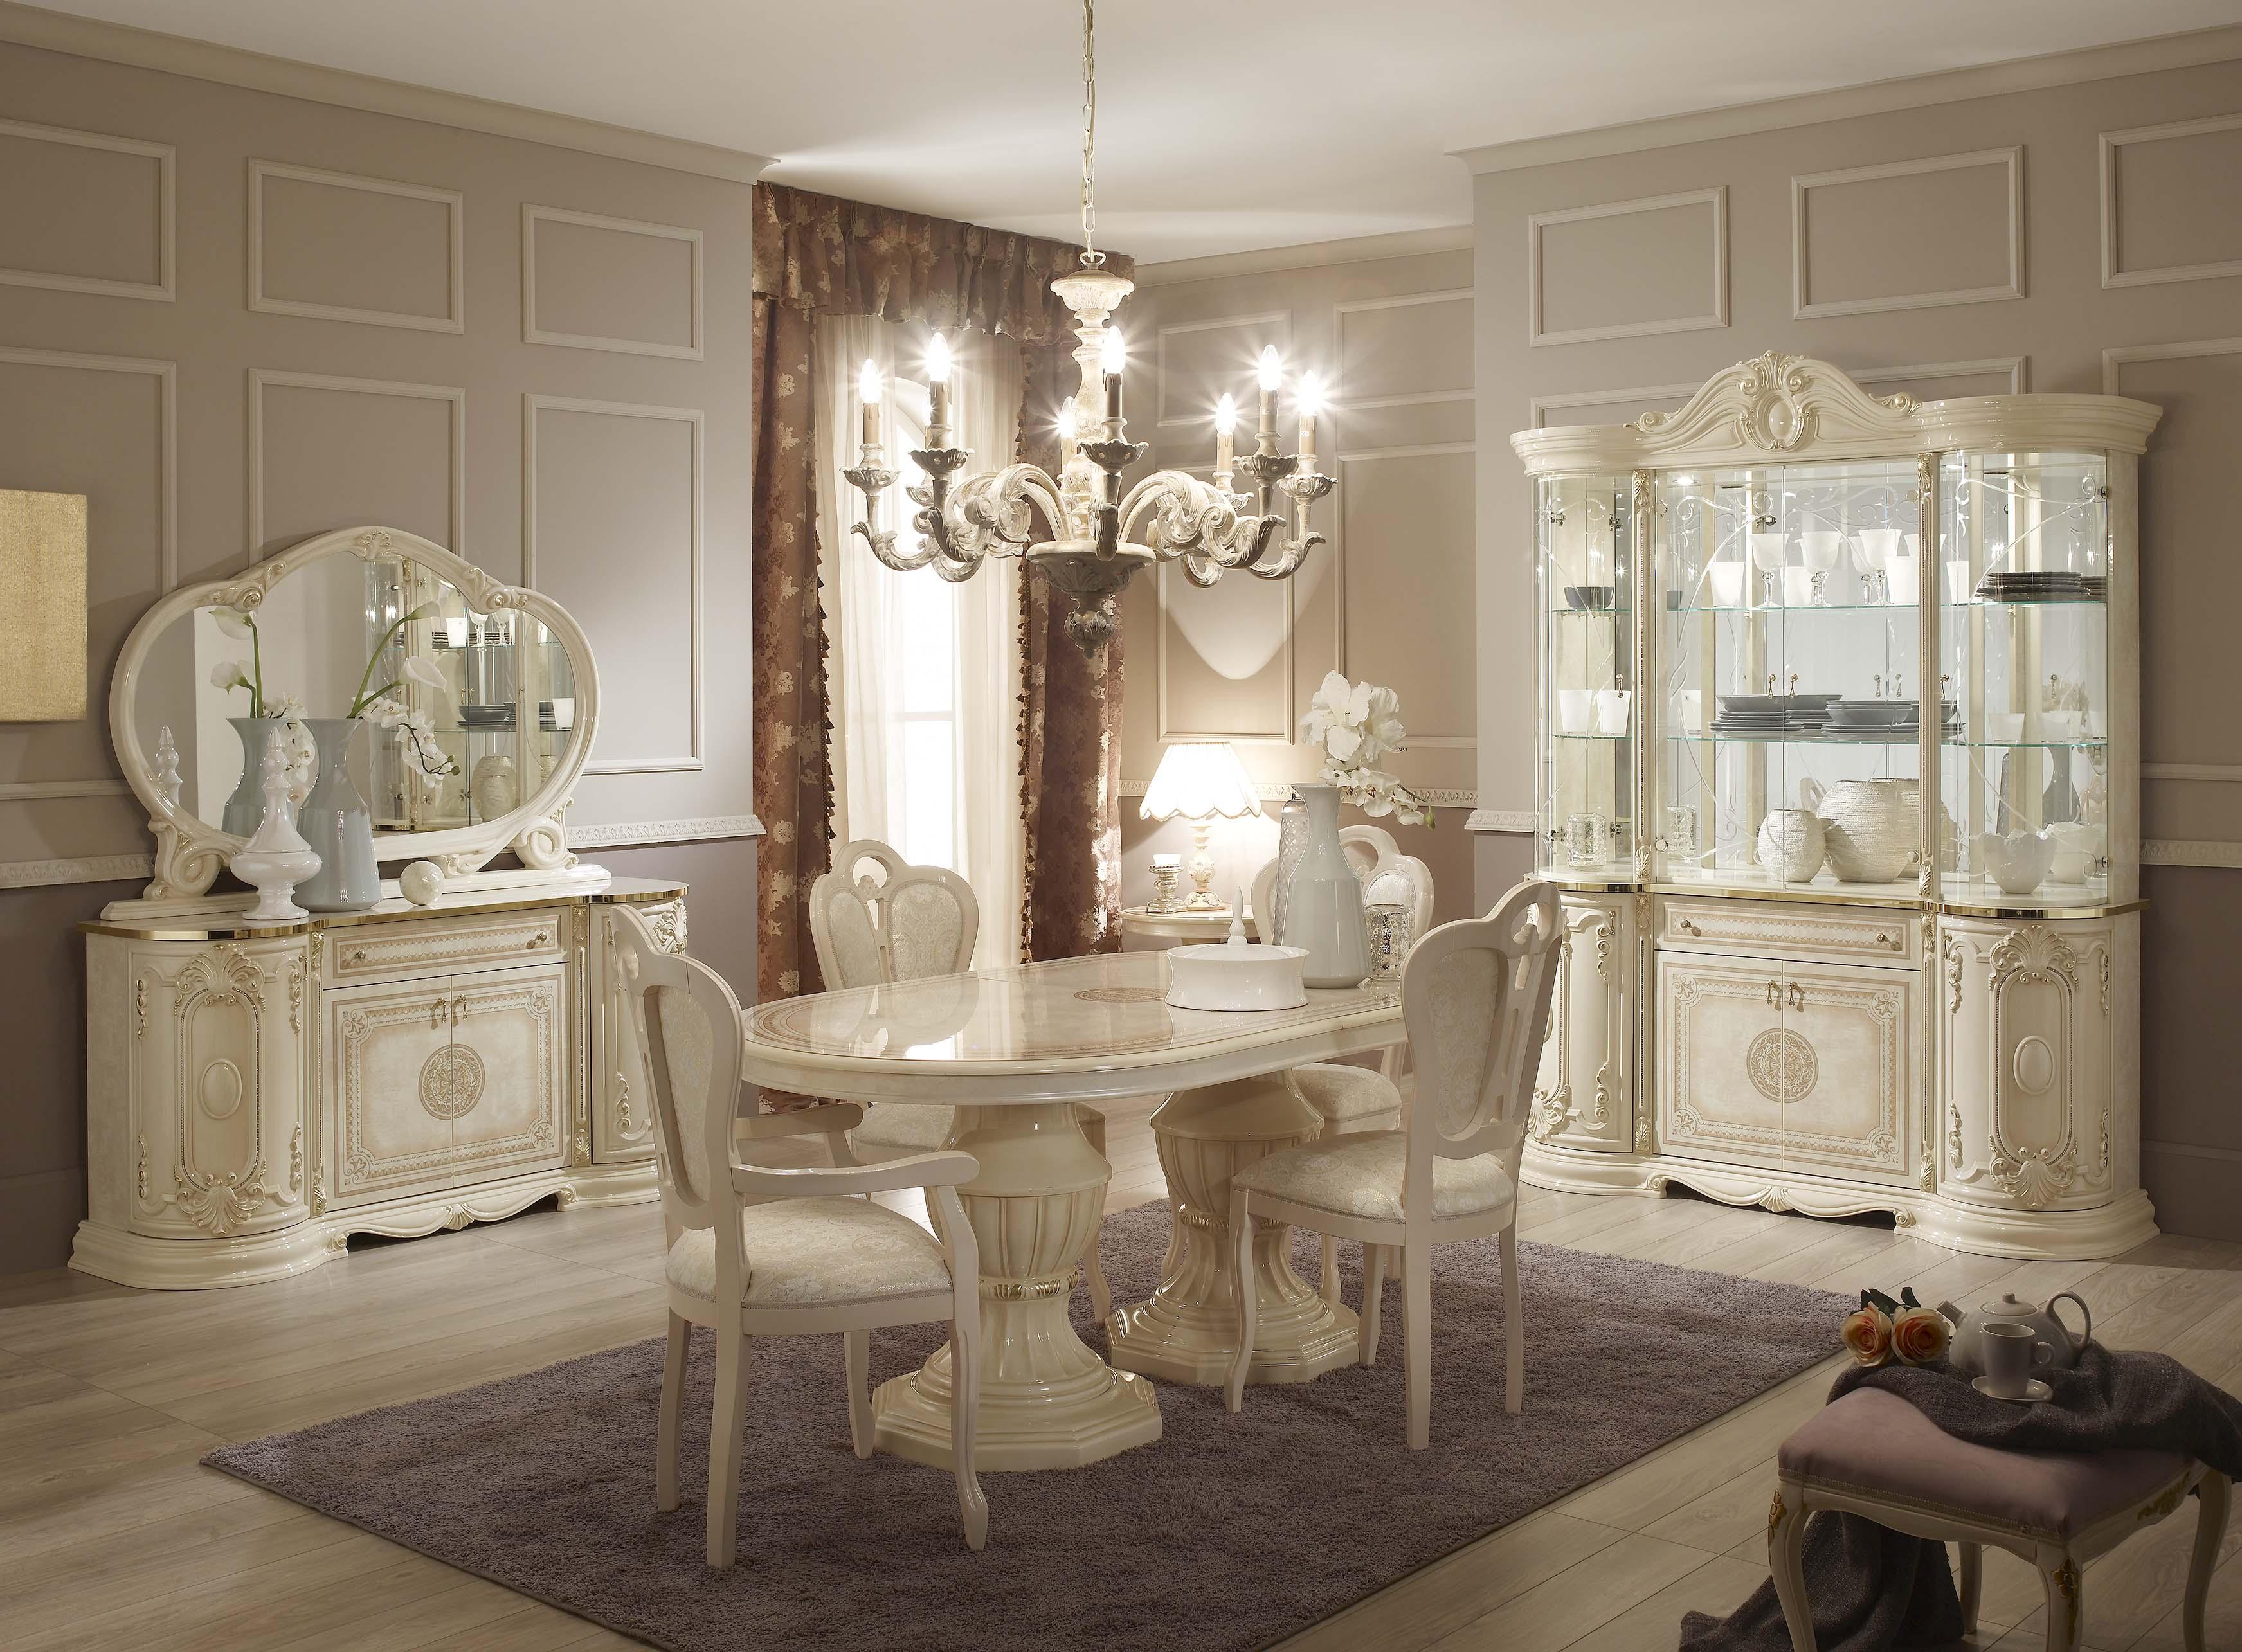 ... Vitrine 2 Trg Great Weiss Silber Italienisch Klassik Barock ...